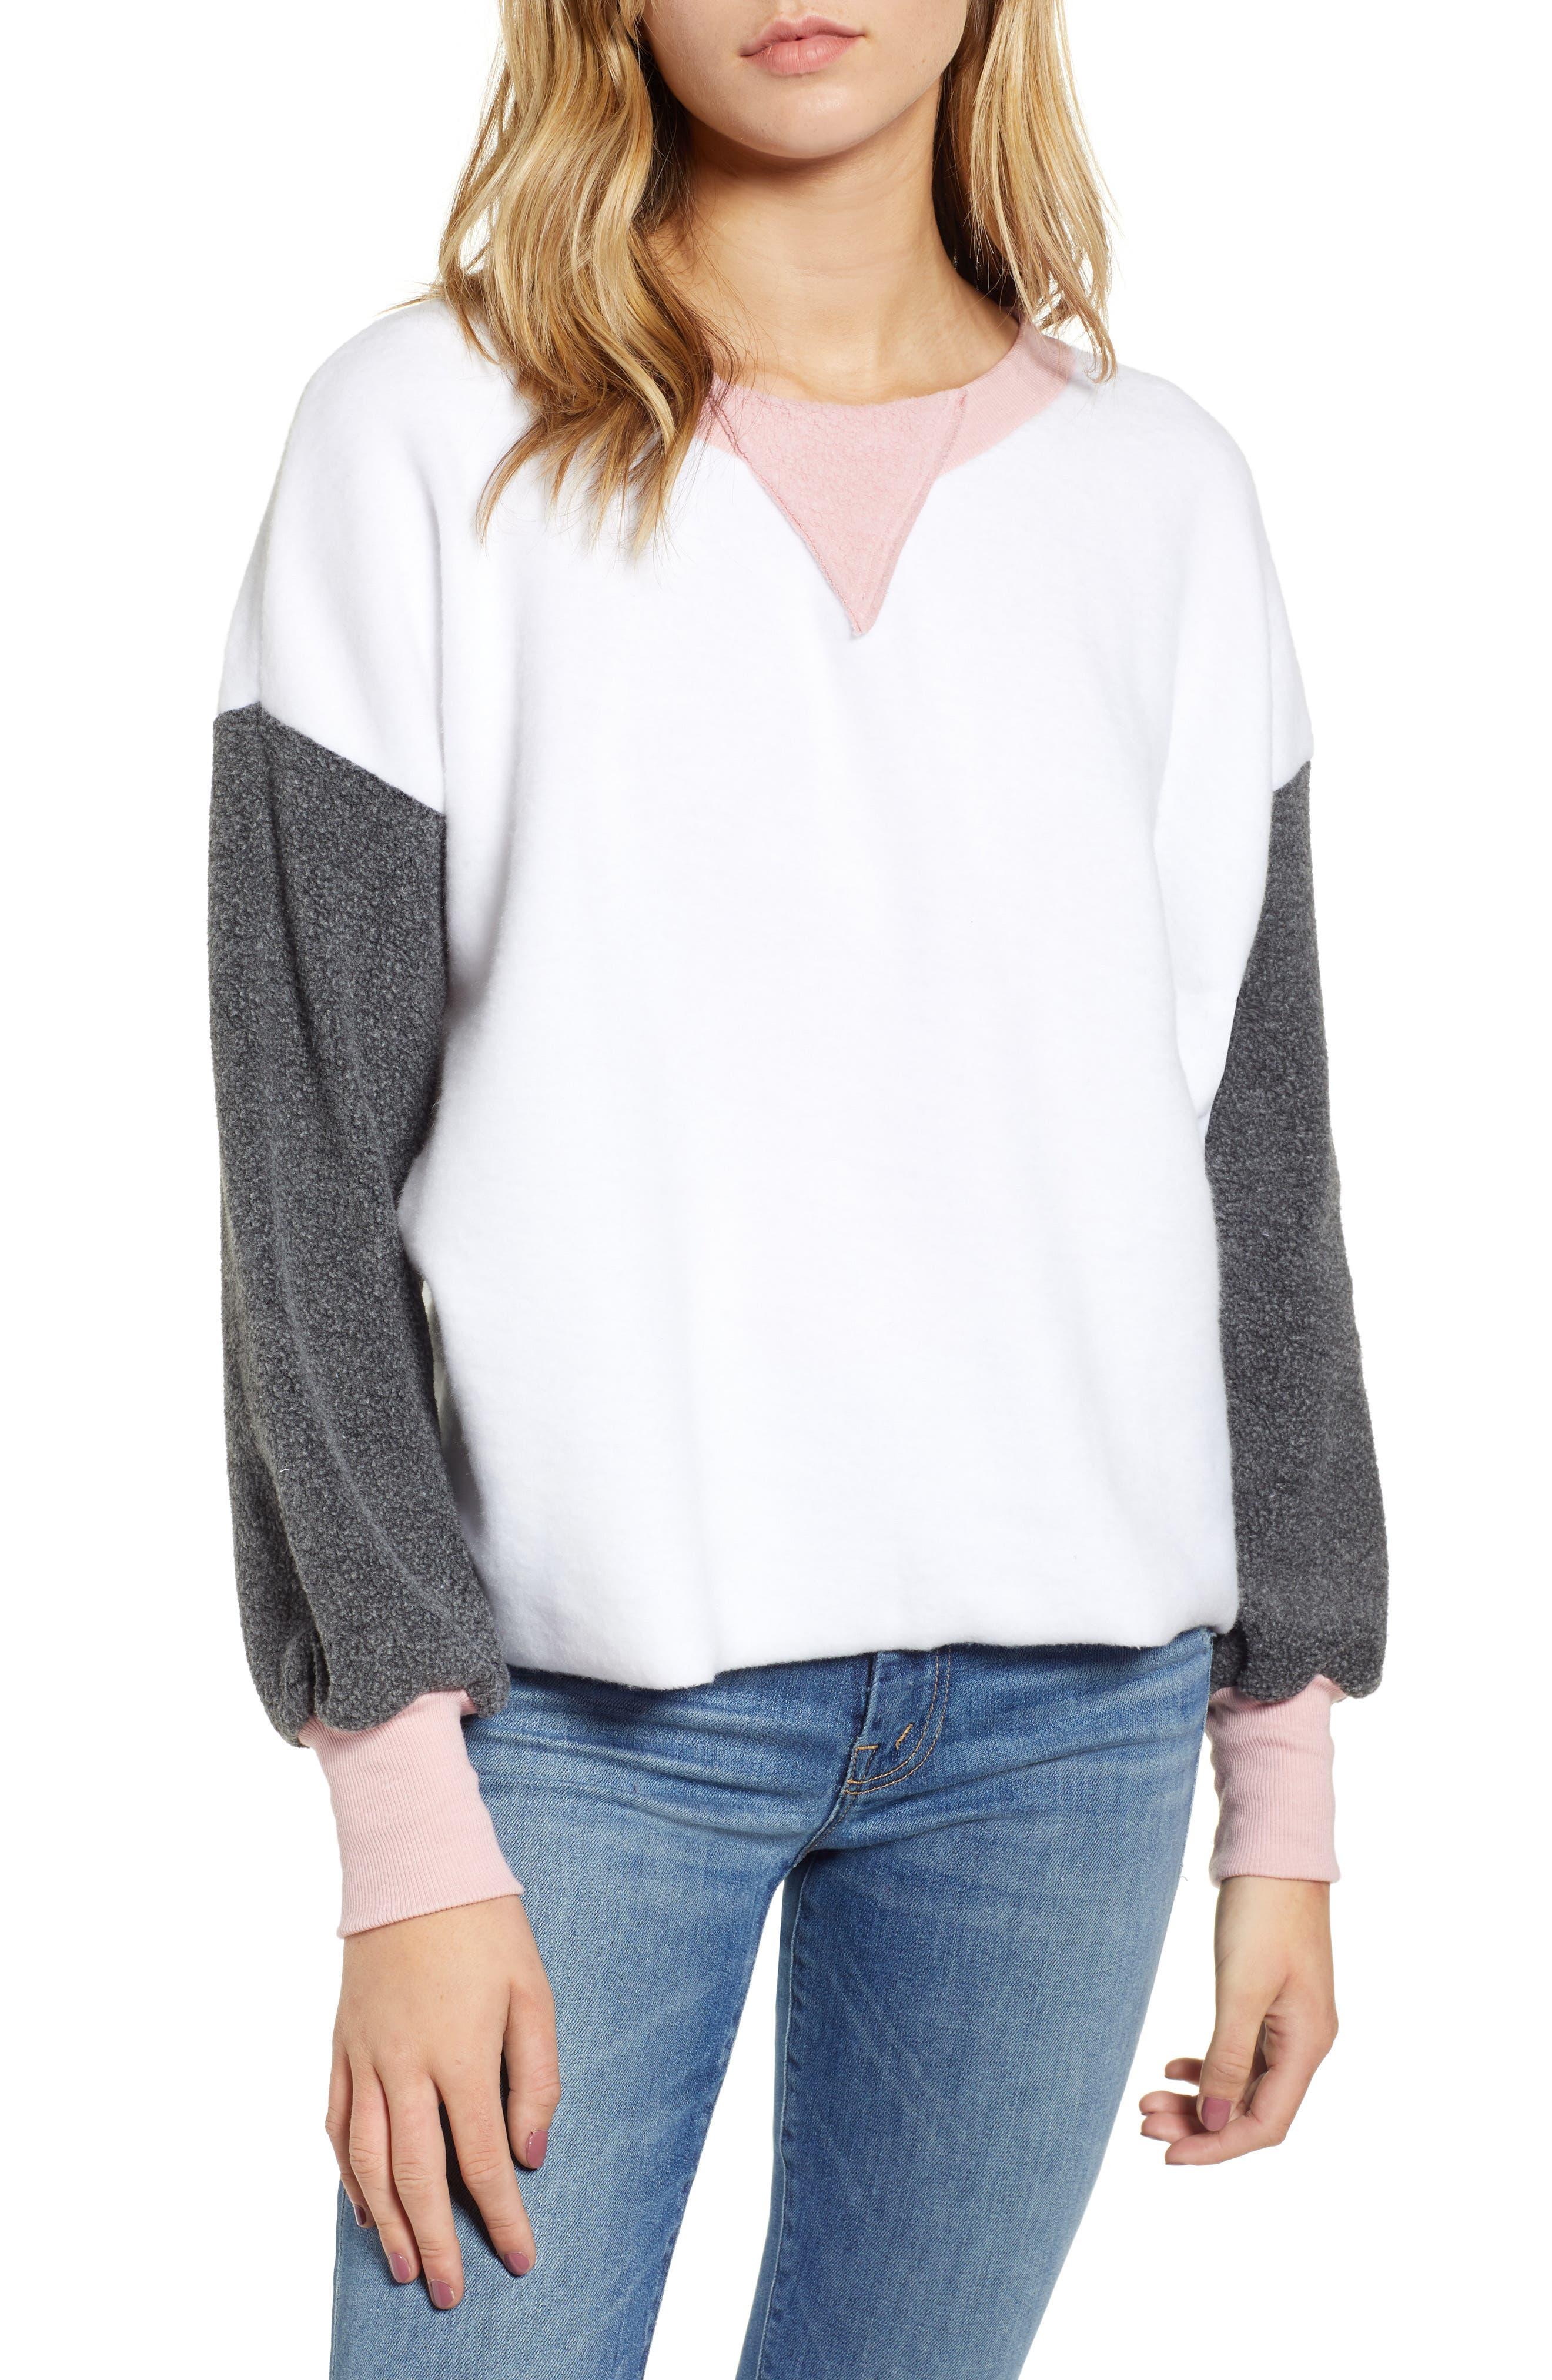 True Love Sweatshirt,                             Main thumbnail 1, color,                             CLEAN WHITE MULTI